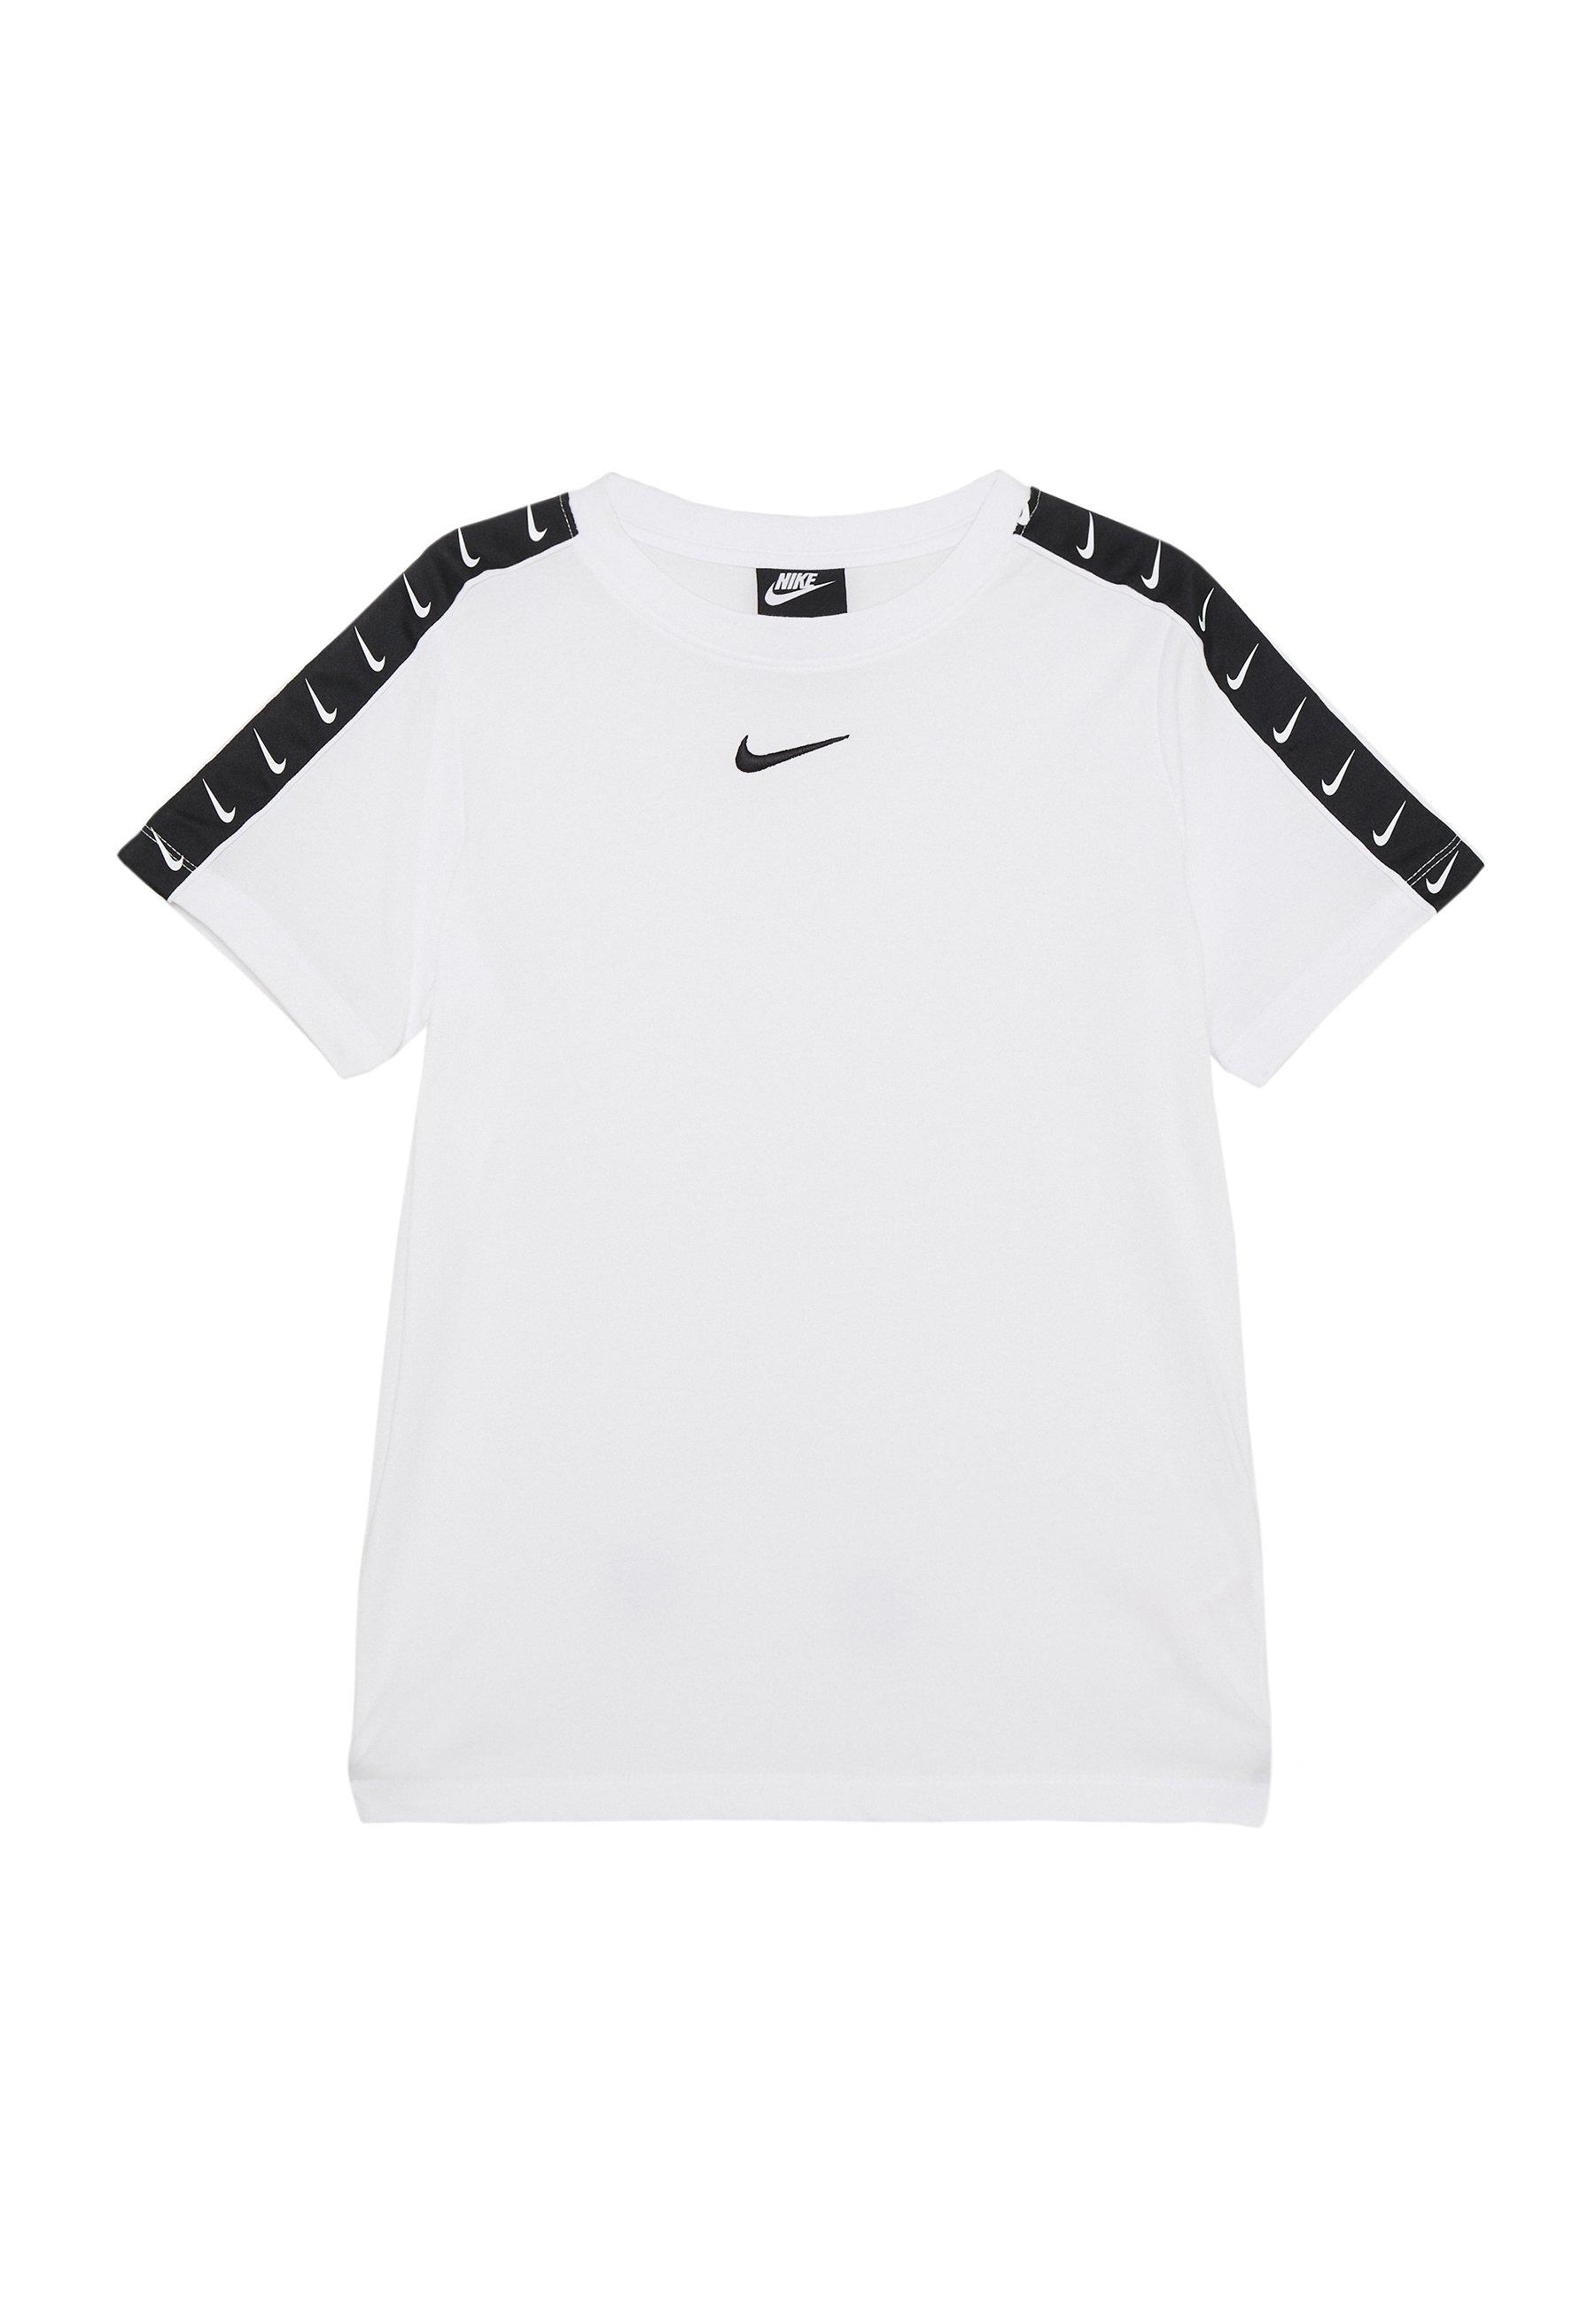 TEE TAPE T shirt imprimé white